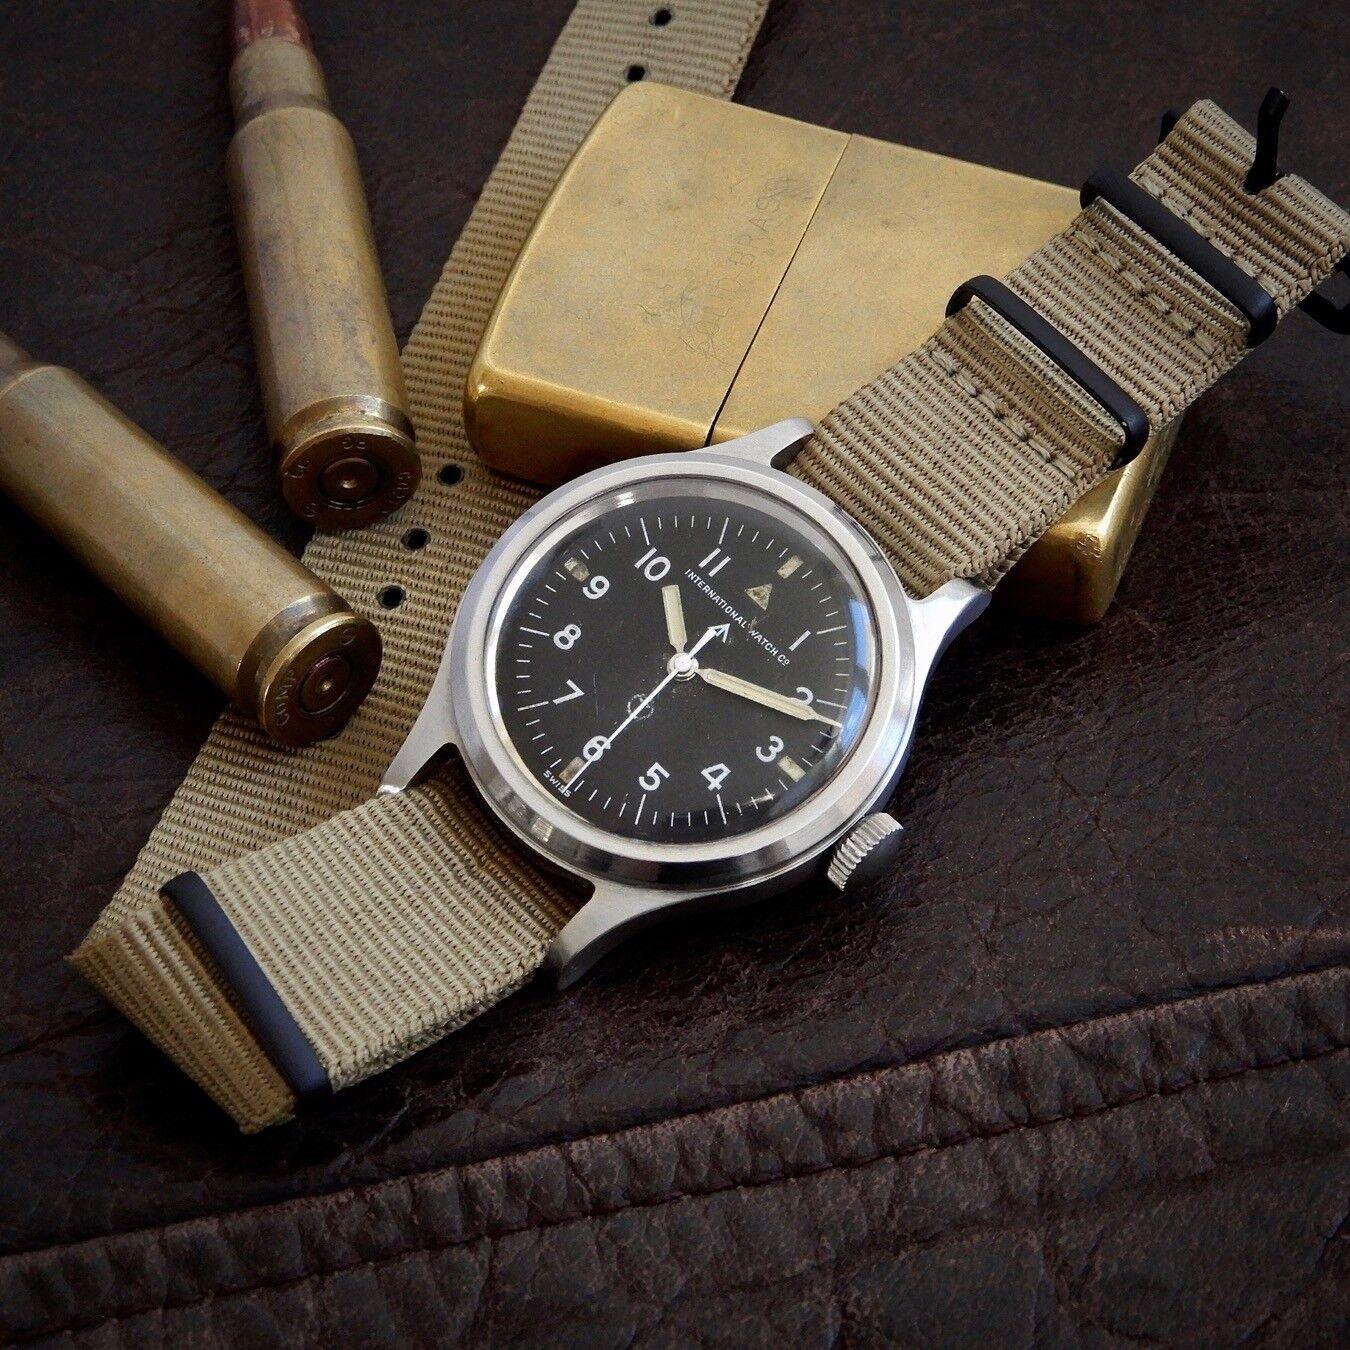 IWC Mark 11 XI Cal 89 Original British Military MoD Issued Watch 6b/346 1952 RAF - watch picture 1